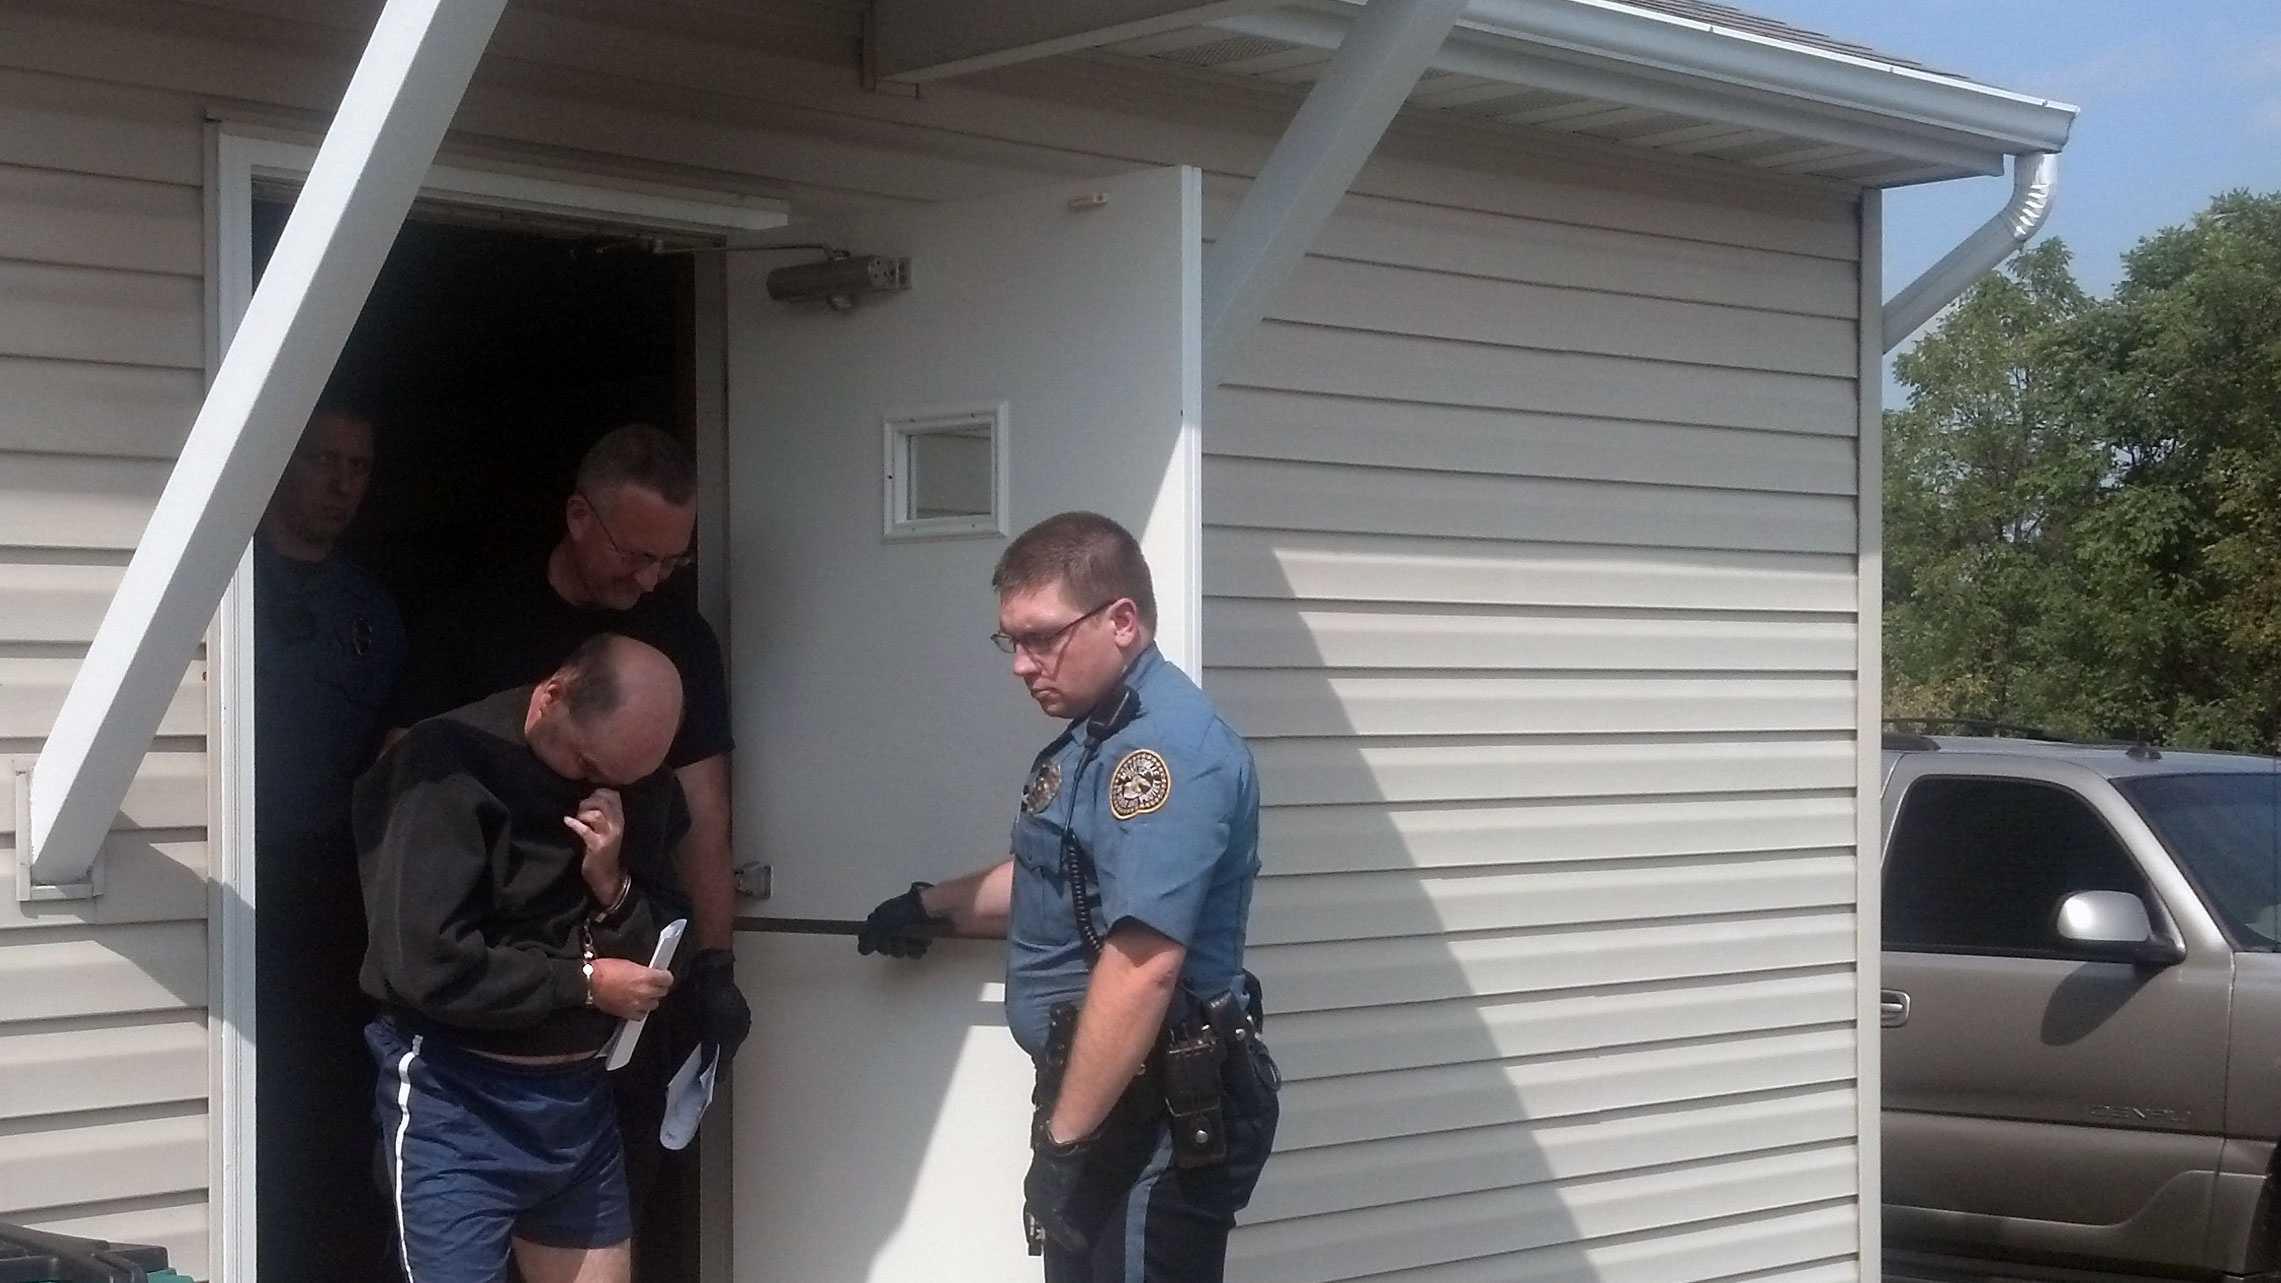 9.17 burglary suspect